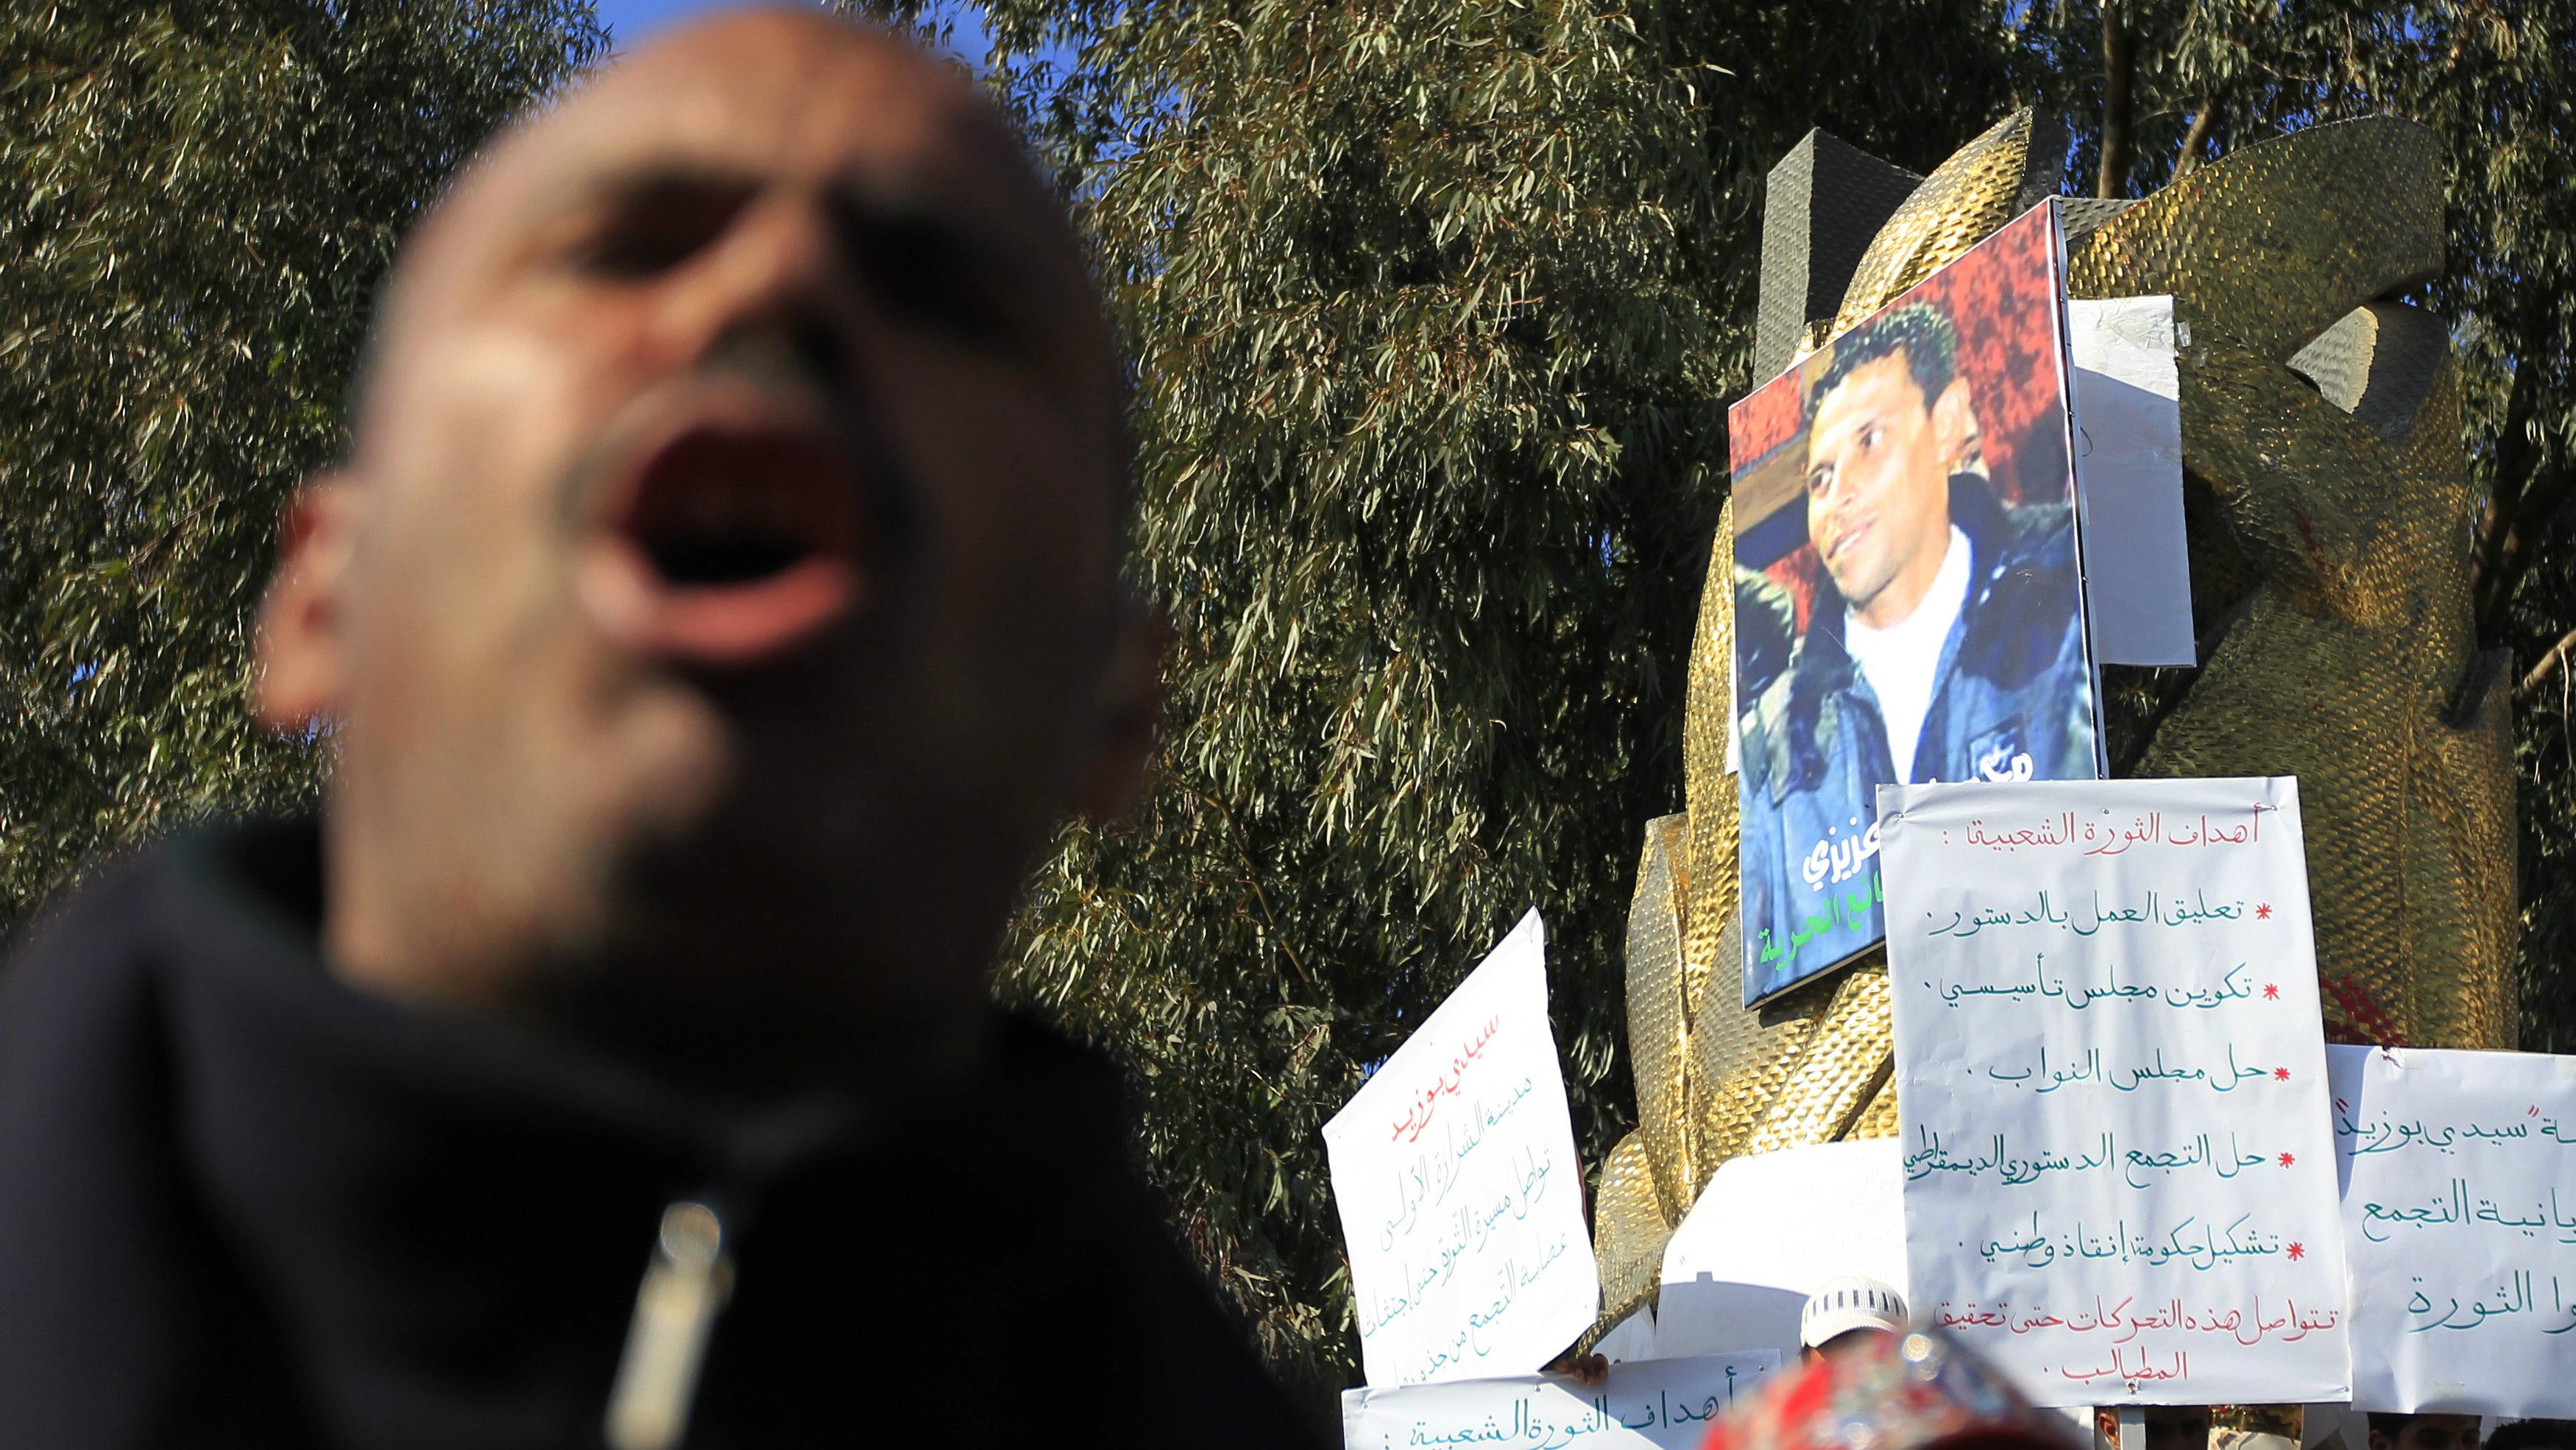 Tunisians protest near a government building where Mohamed Bouazizi set himself alight in Sidi Bouzid January 19,2011.